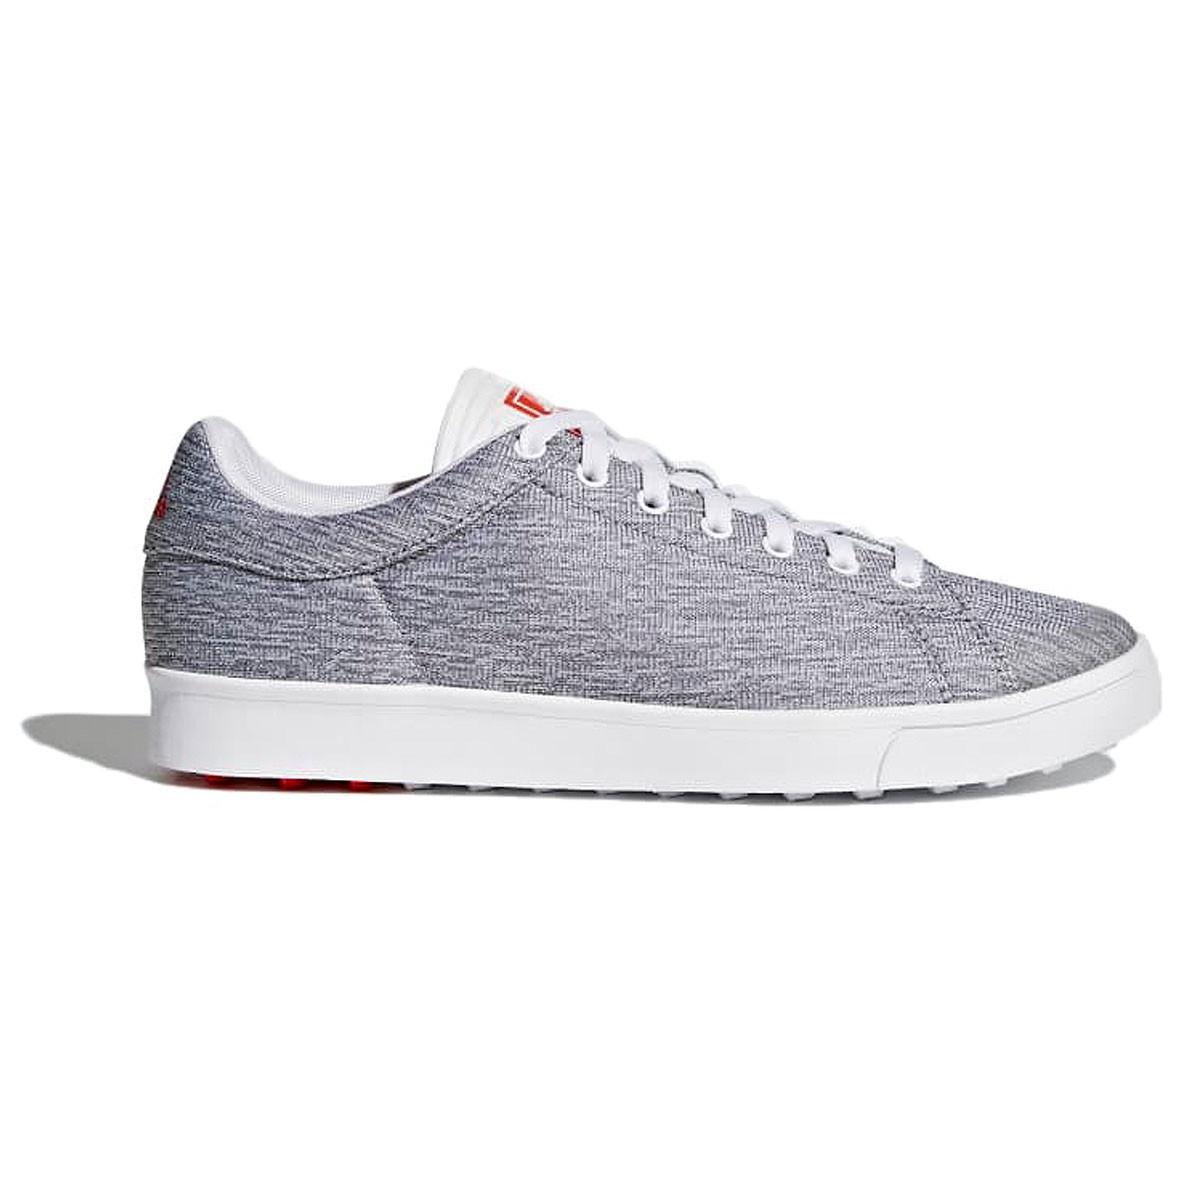 854c15bb3132c adidas Golf Mens Adicross Classic Golf Shoes